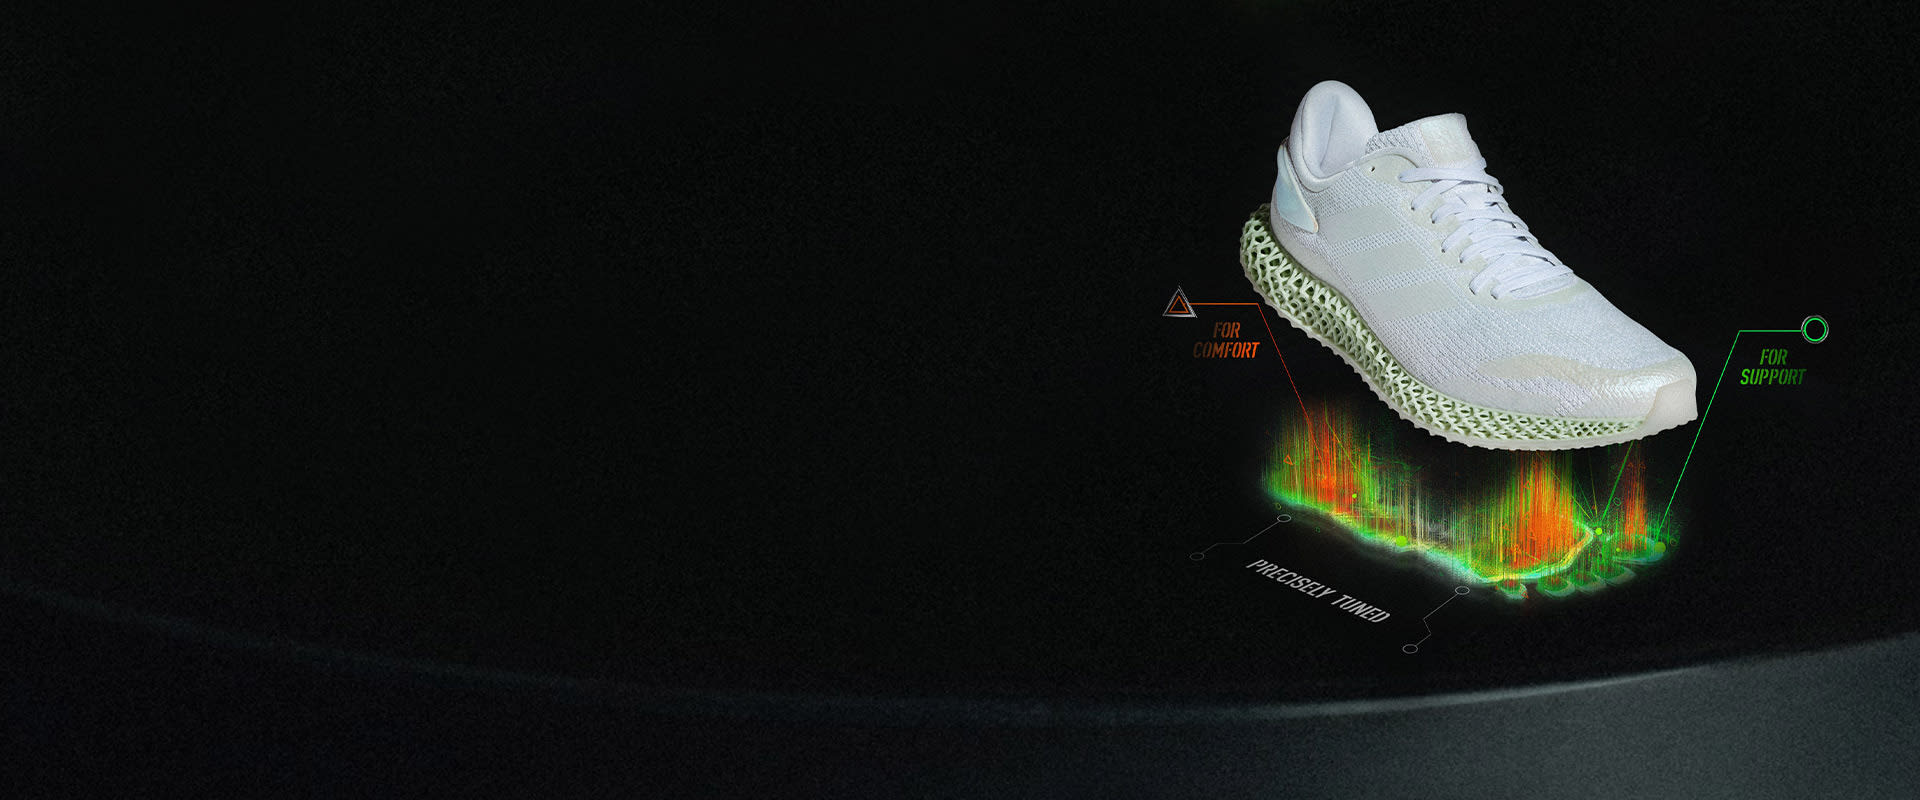 scarpe bambino adidas sportive 30